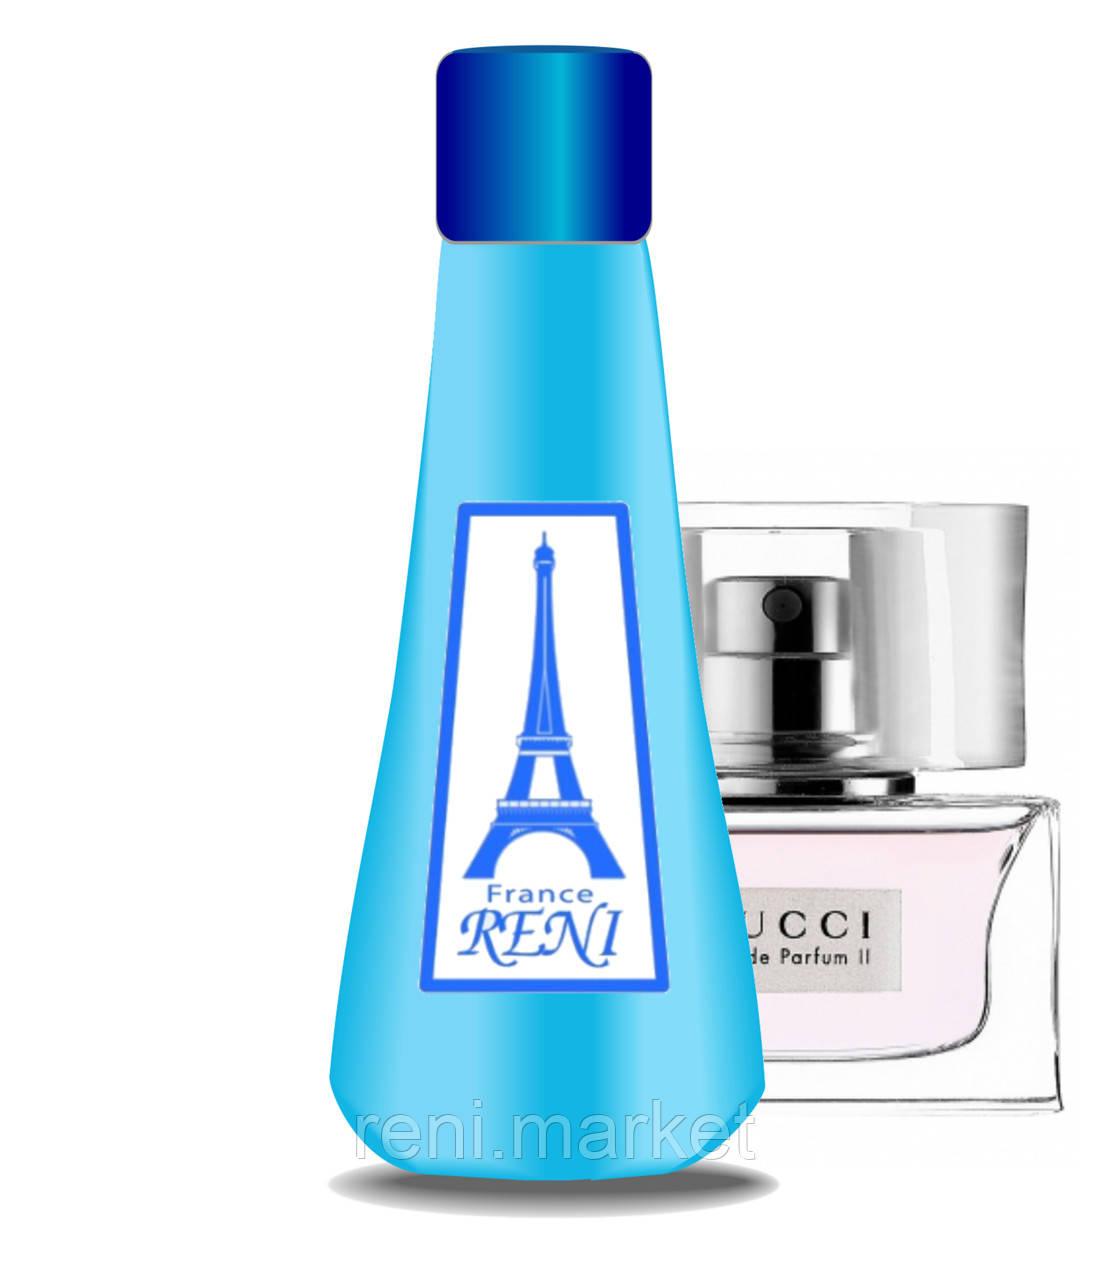 рени духи на разлив наливная парфюмерия 333 Gucci Eau De Parfum